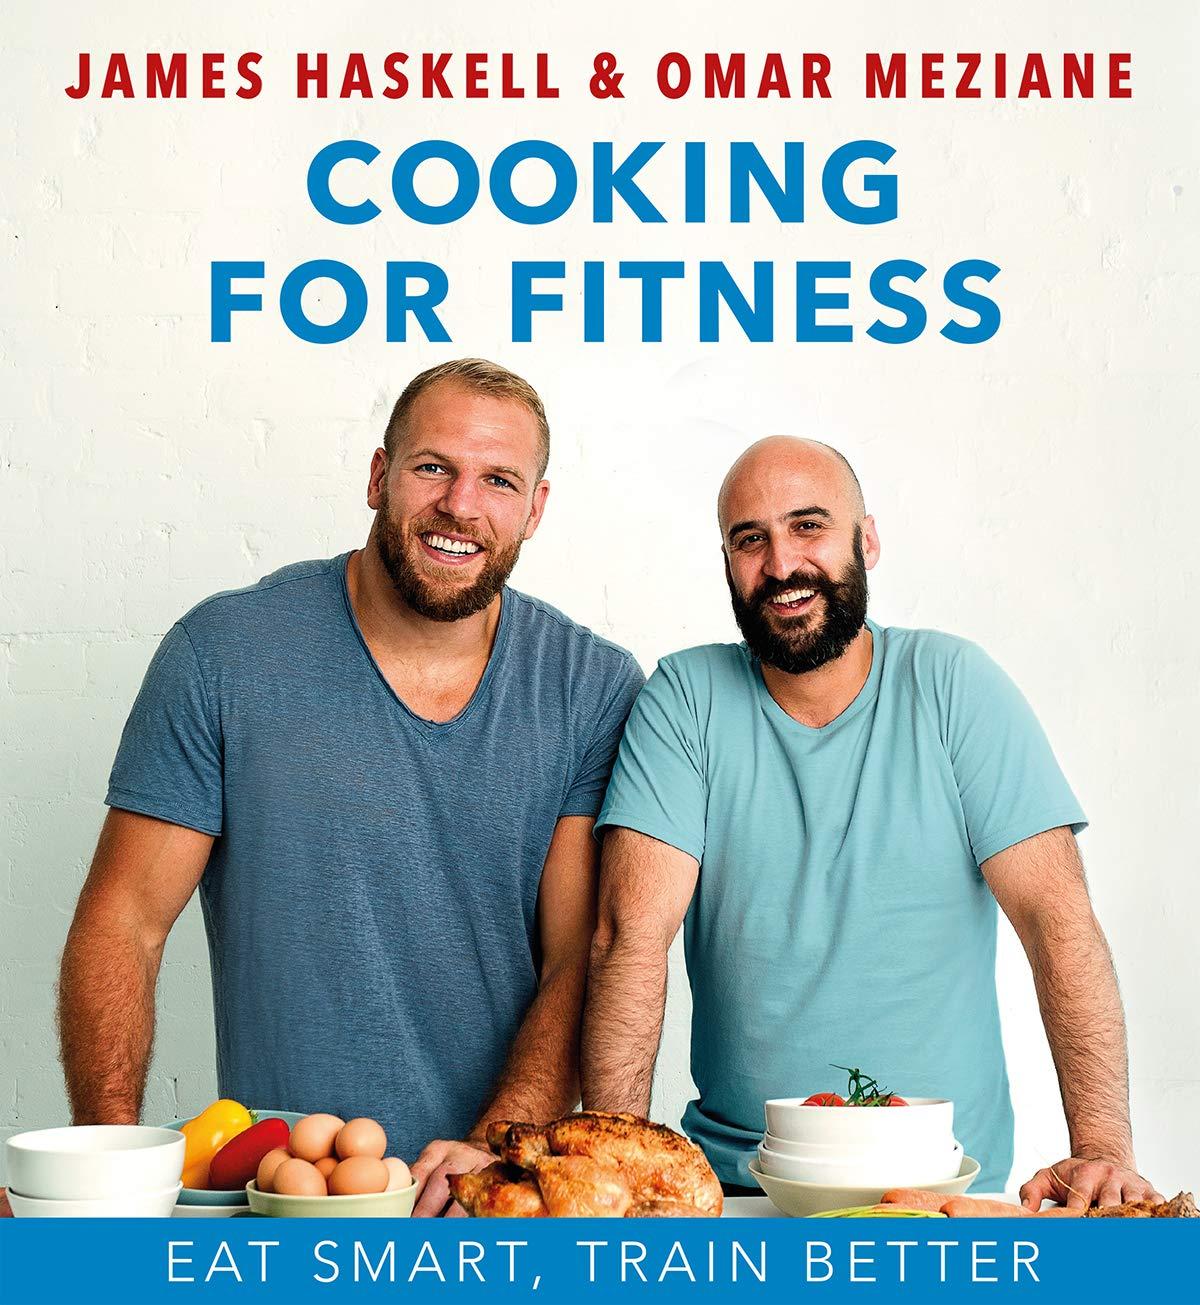 Cooking For Fitness Eat Smart Train Better Haskell James Meziane Omar 9780995544642 Amazon Com Books